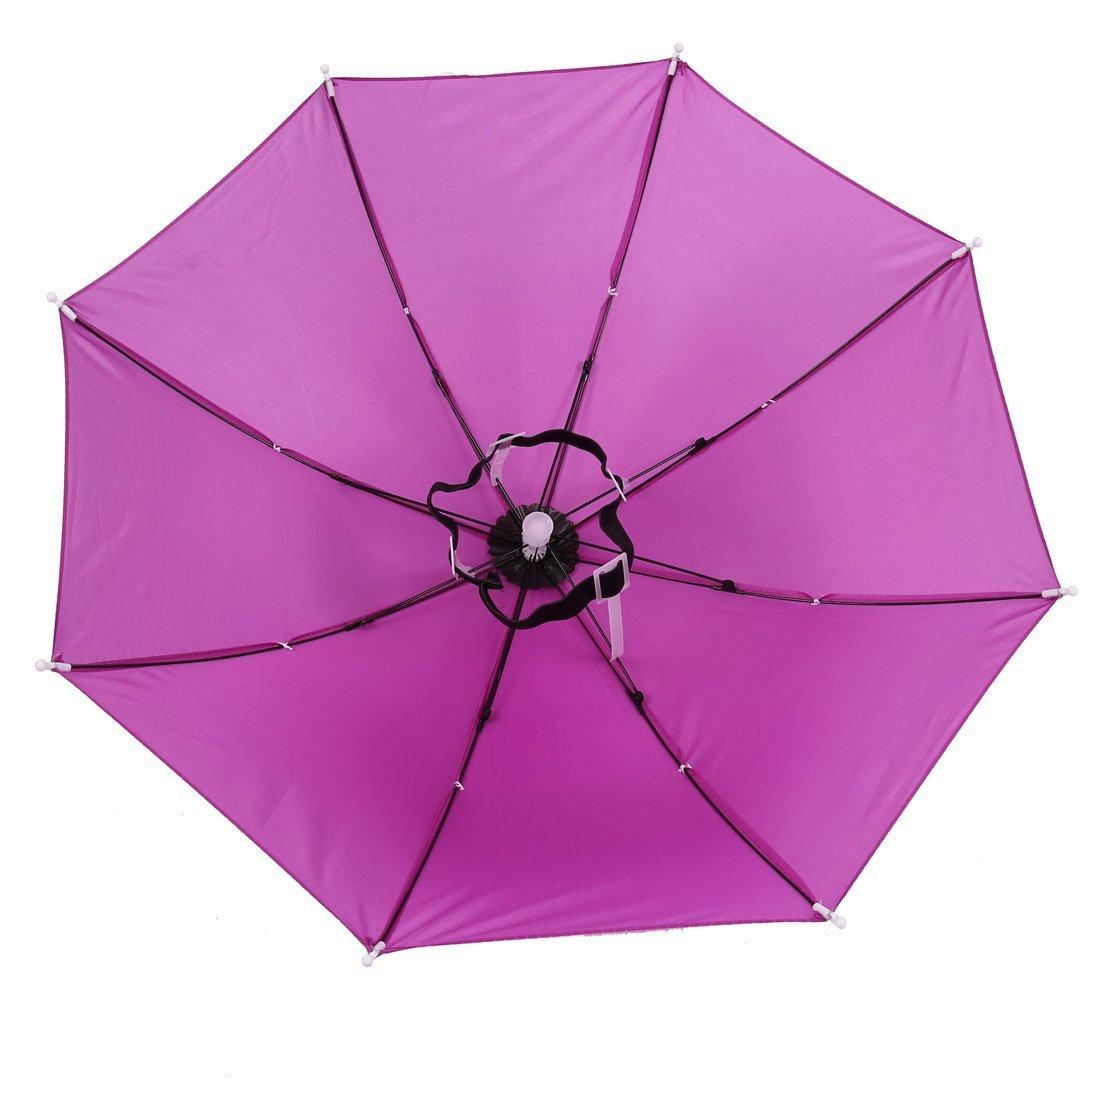 Amazon.com: 21 Diâmetro Fuchsia Pesca Praia Esportes Hands Free elástico Umbrella Hat: Home & Kitchen